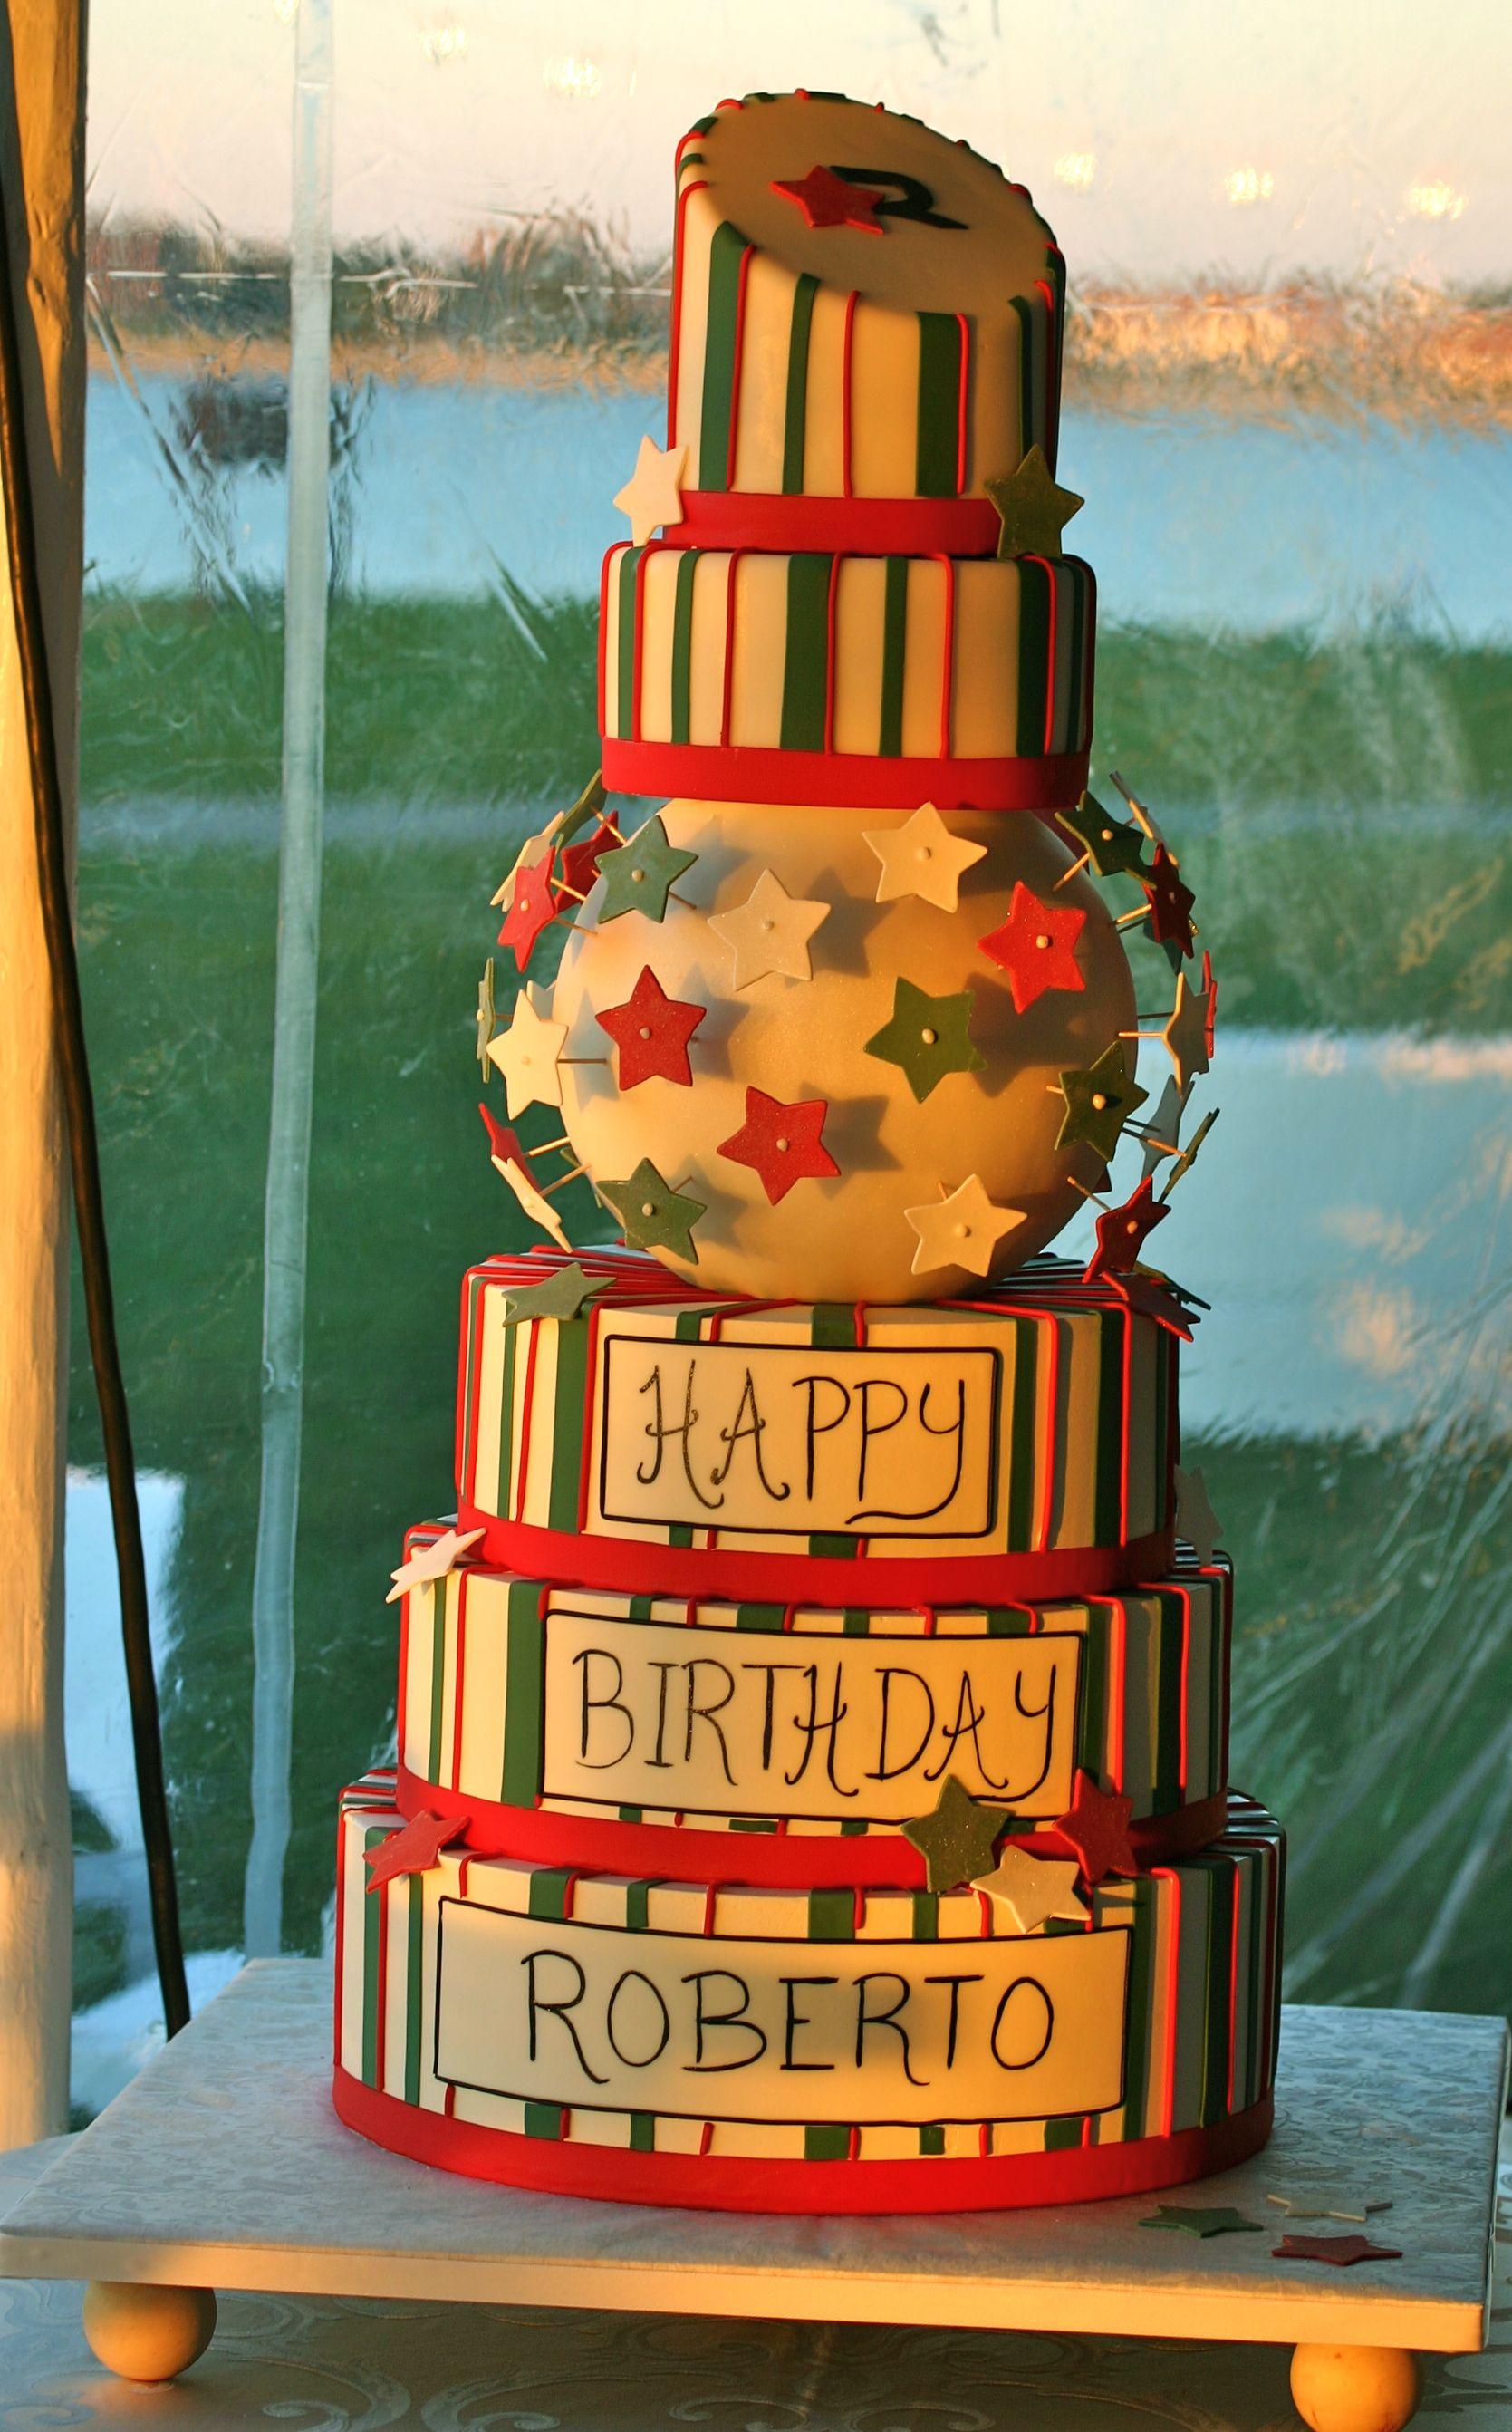 Birthday cake italian style creative baking no